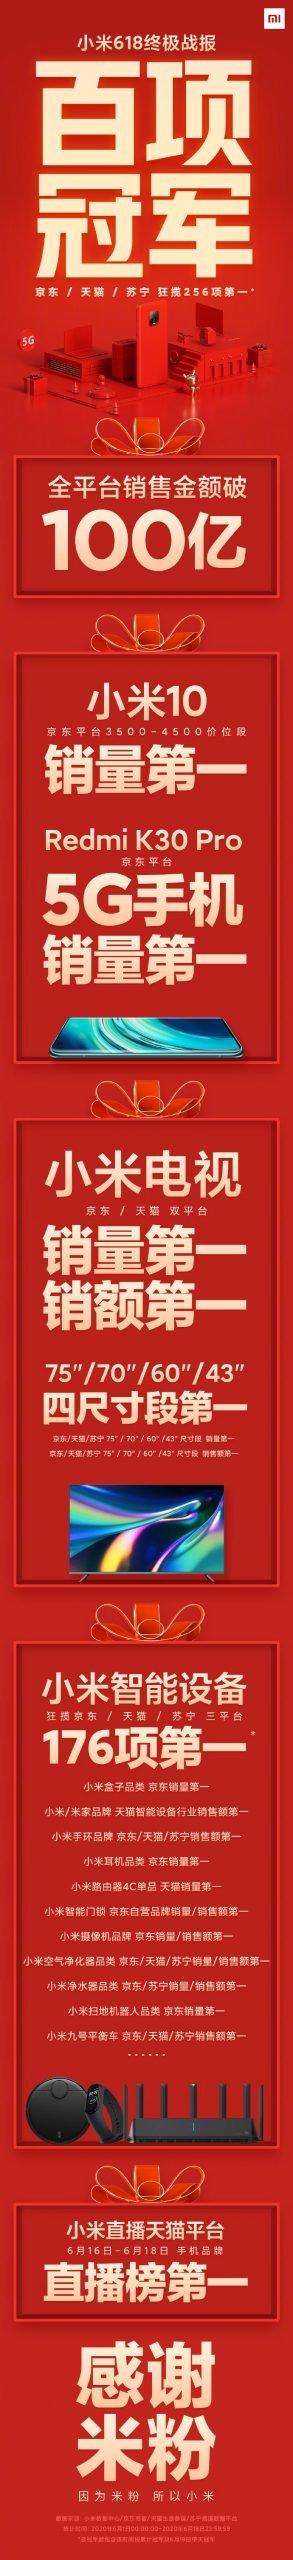 Xiaomi 618 promotion